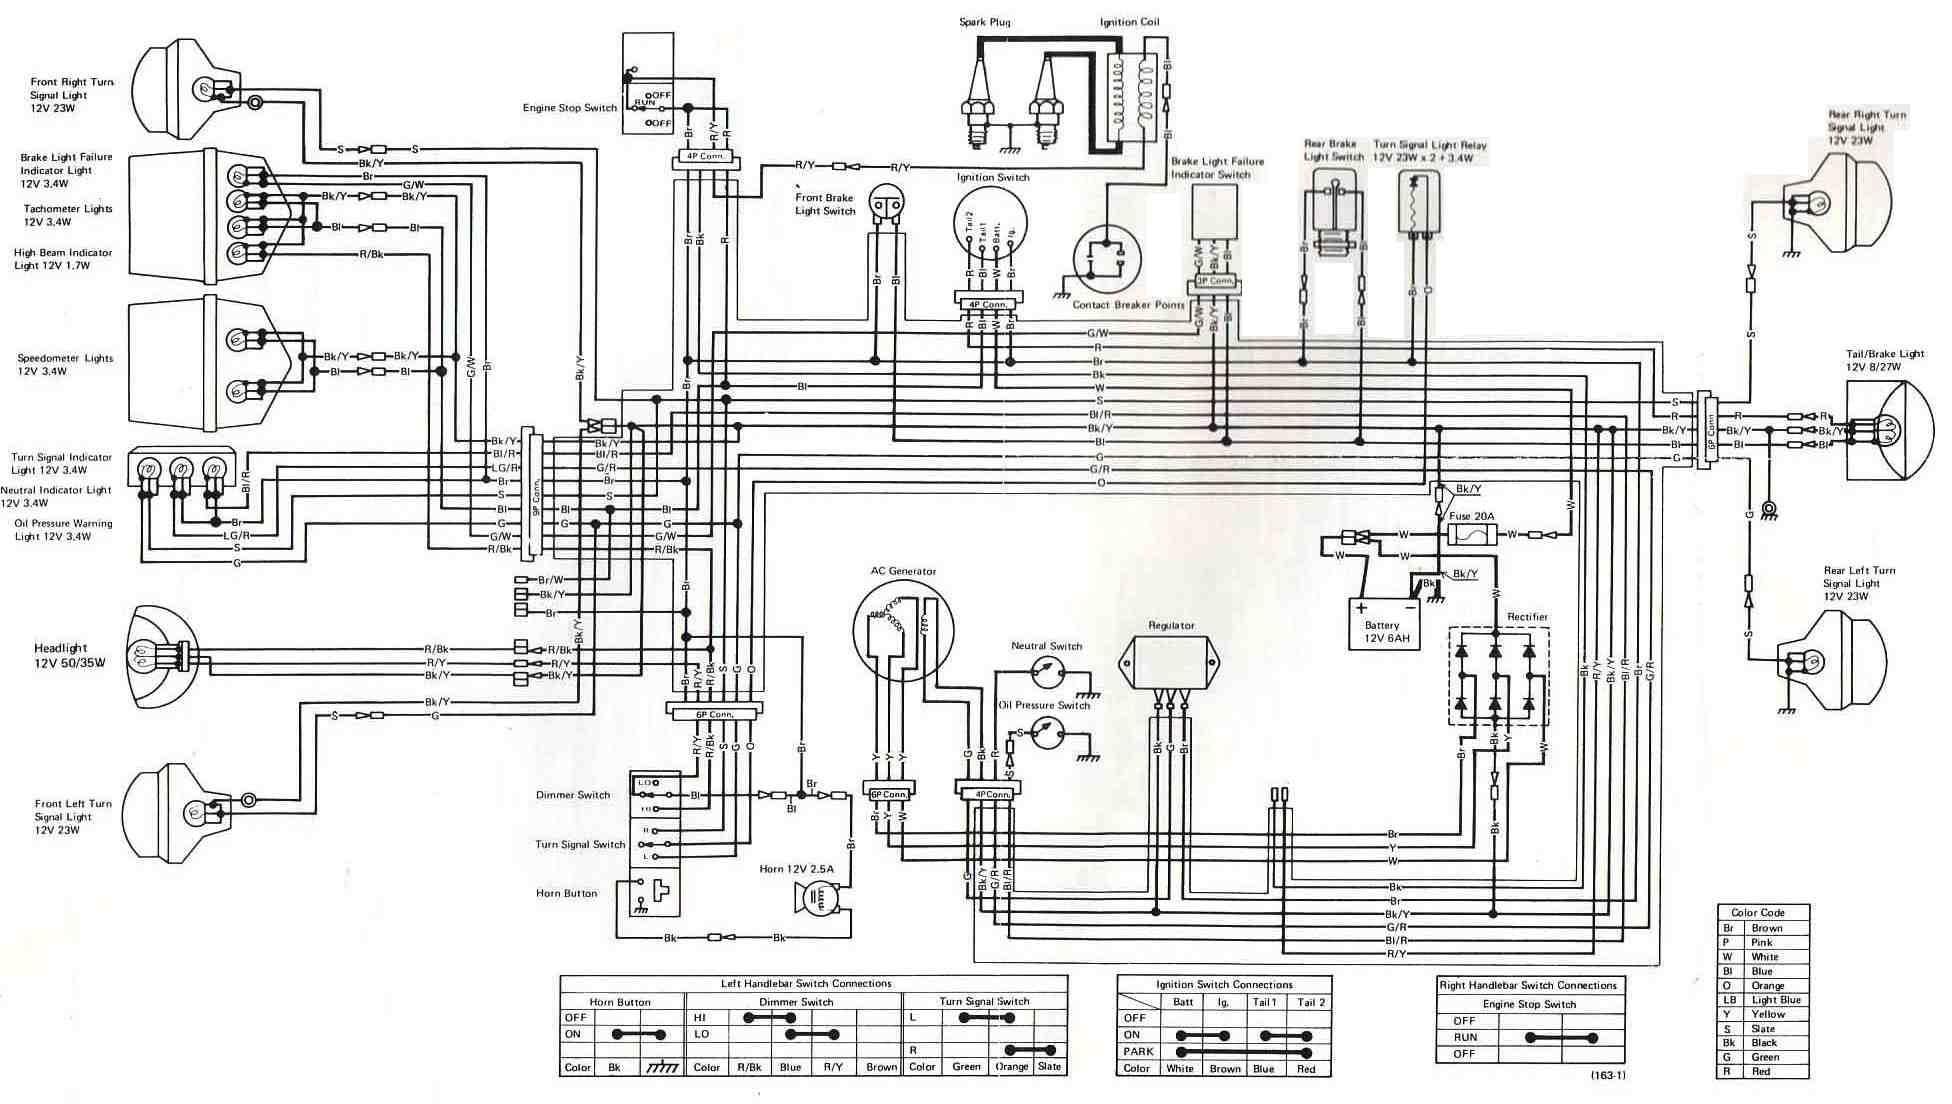 2000 kawasaki zxi 1100 wiring diagram